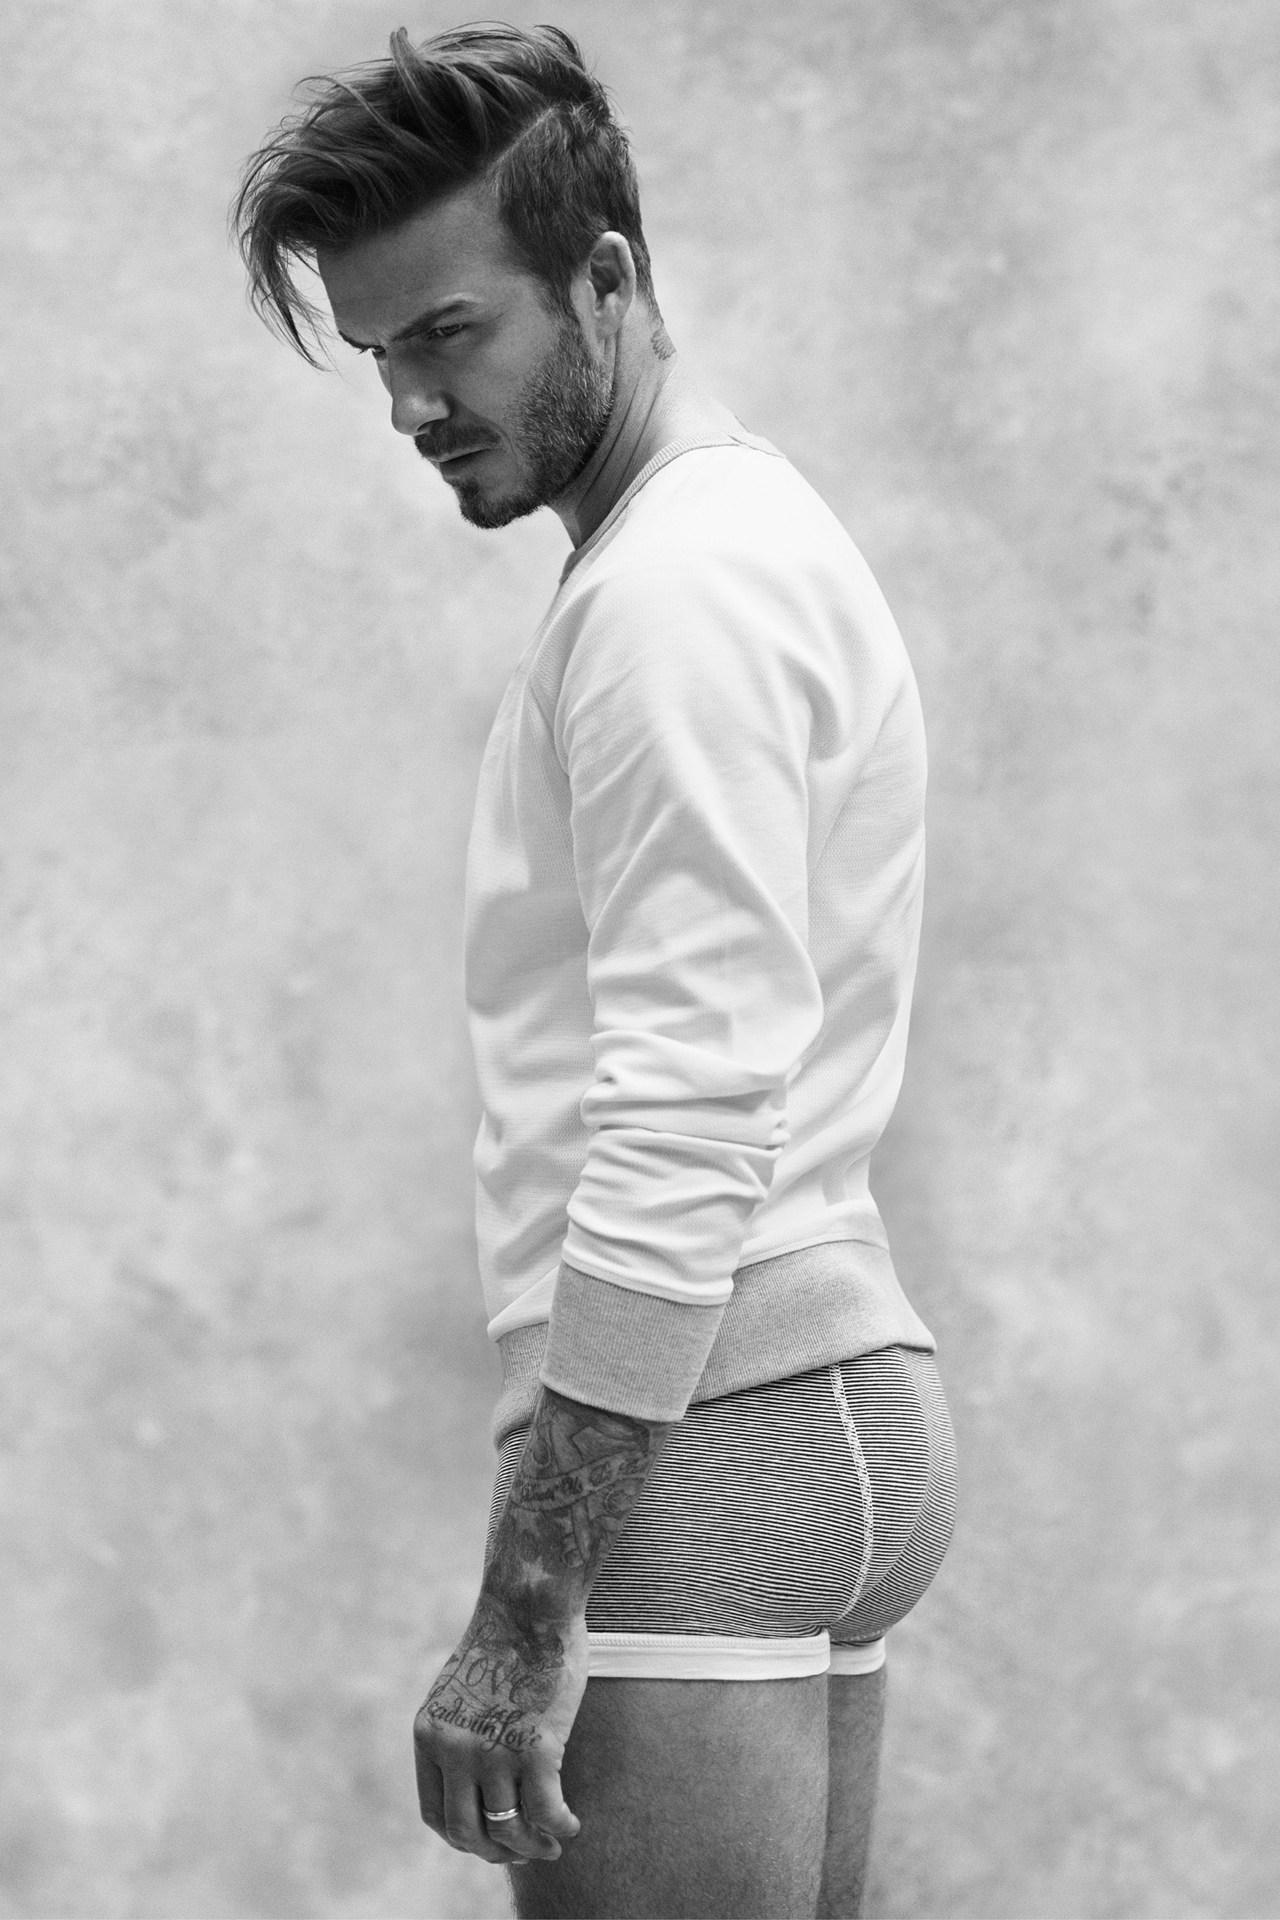 David-Beckham-HM 4-Vogue 20Jan15 pr_b_1280x1920